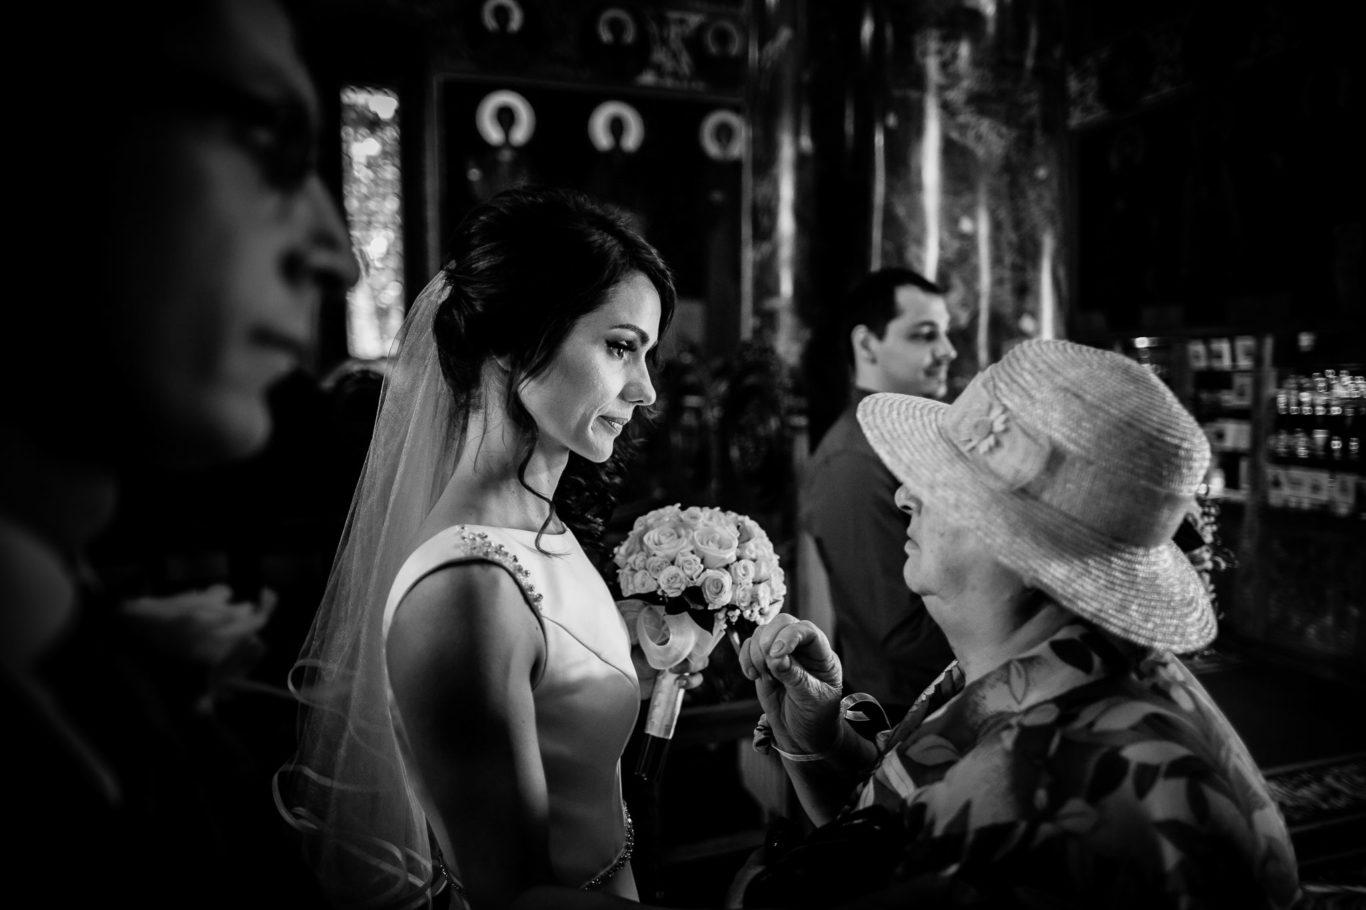 0509-fotografie-nunta-bucuresti-dana-radu-fotograf-ciprian-dumitrescu-dc1_4110